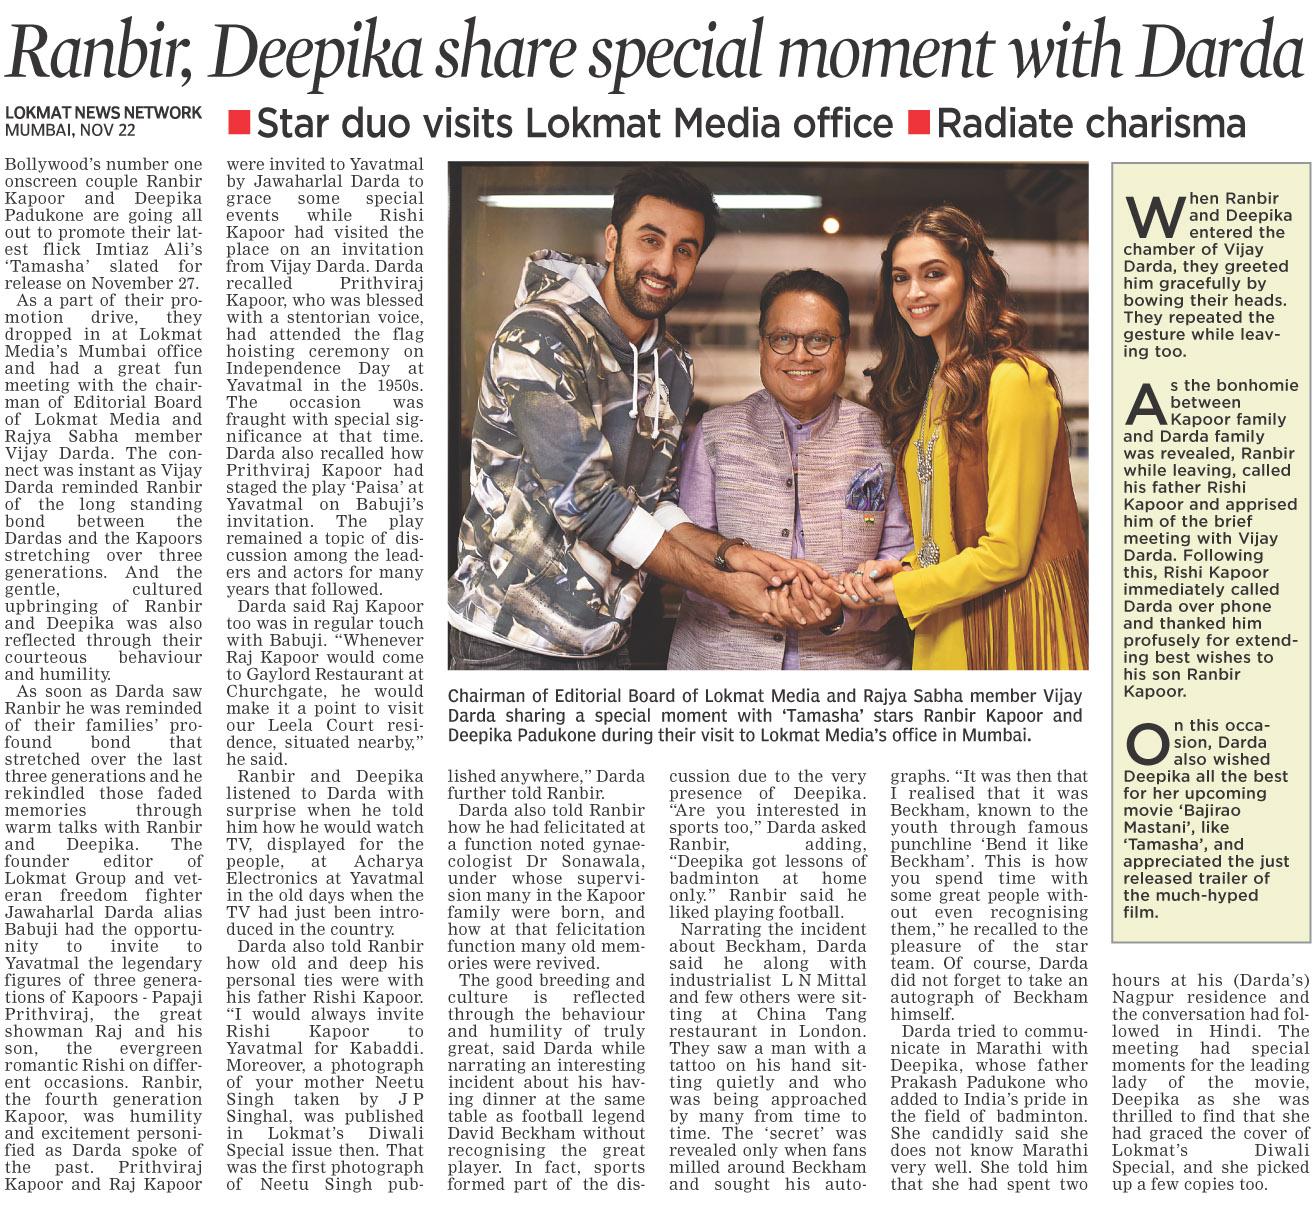 Ranbir, Deepika share special moment with Darda